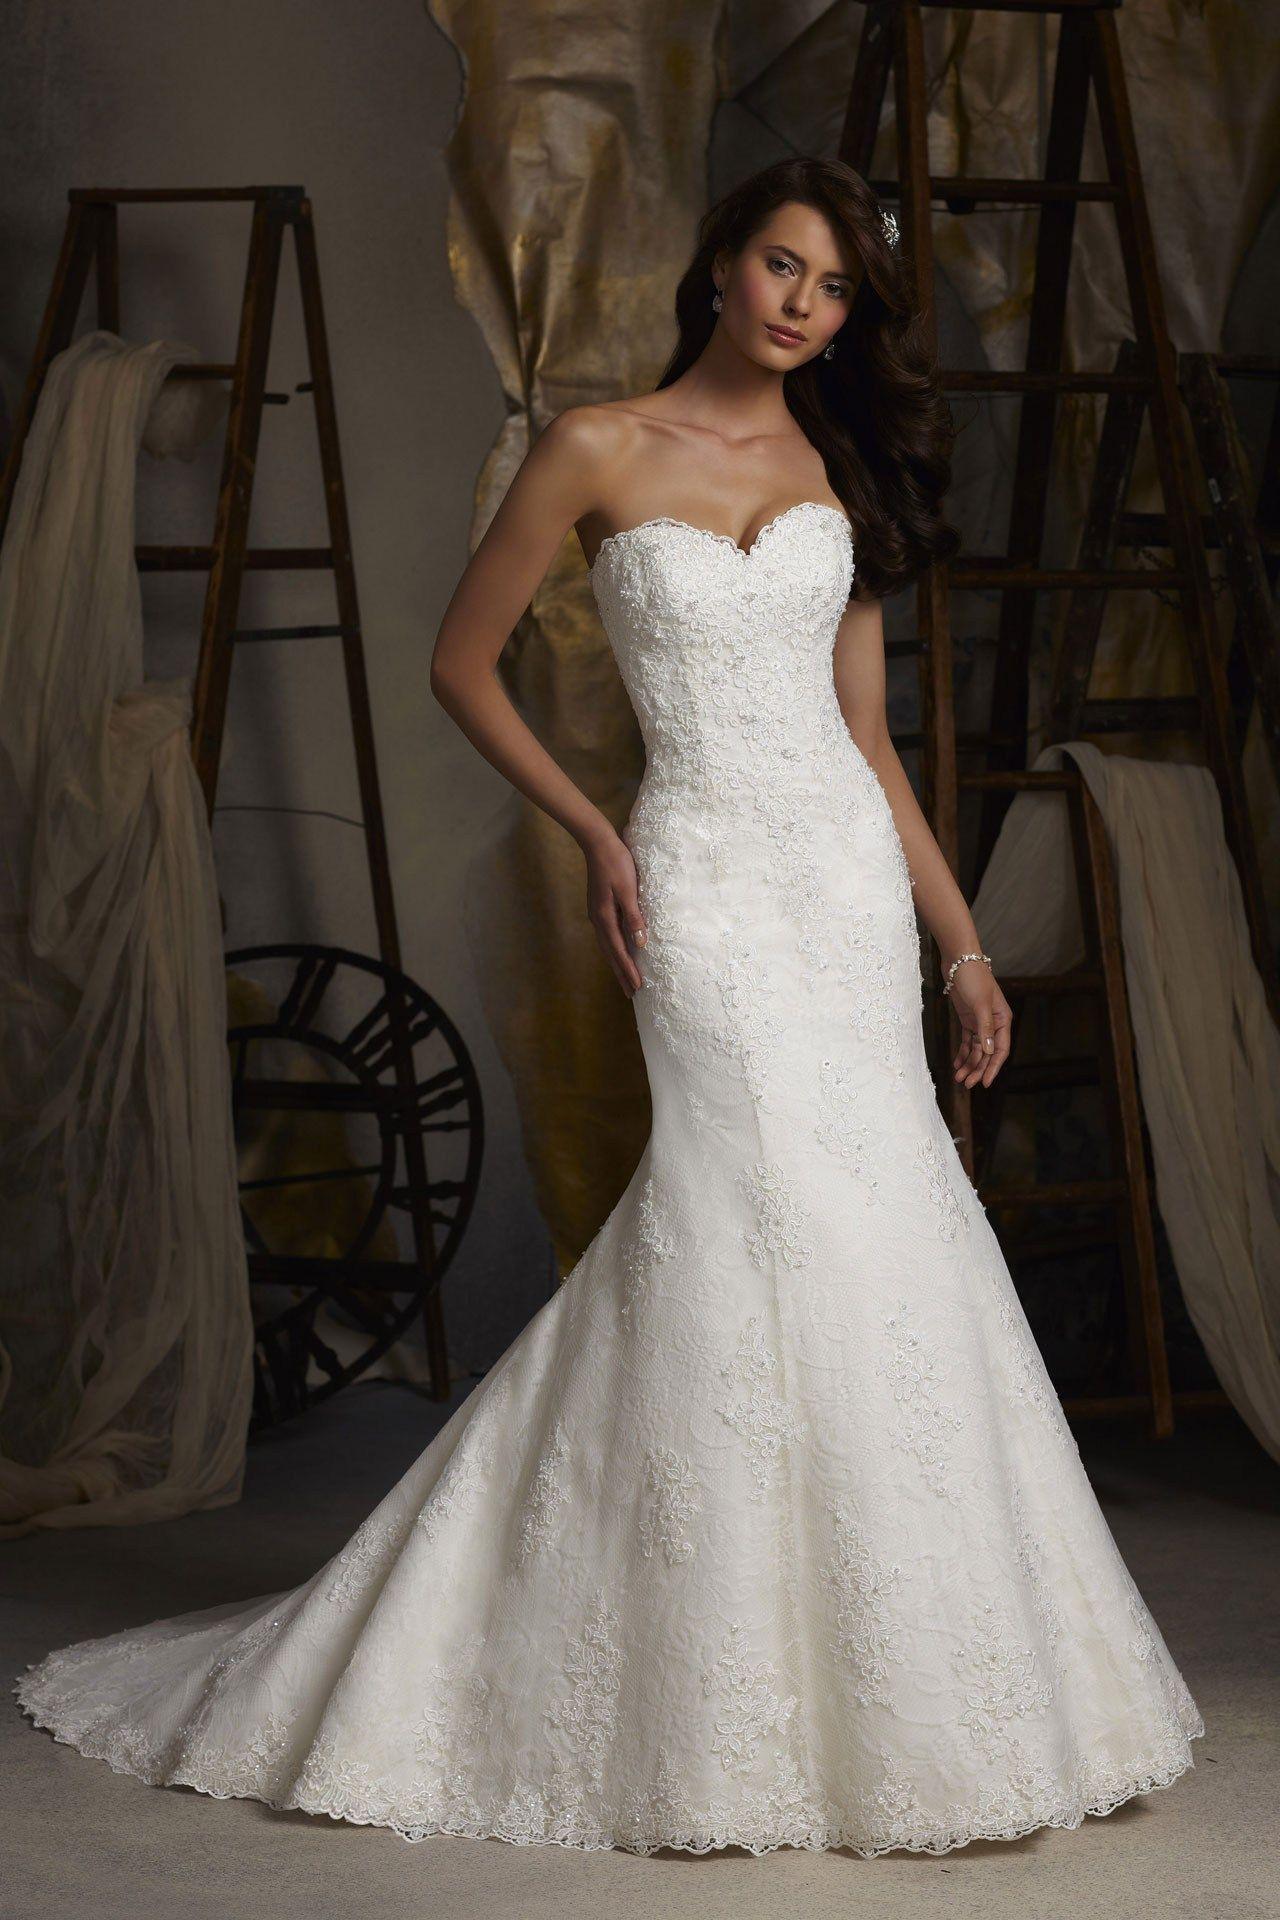 Wedding Dresses - The Ultimate Gallery (BridesMagazine.co.uk) | Mori ...